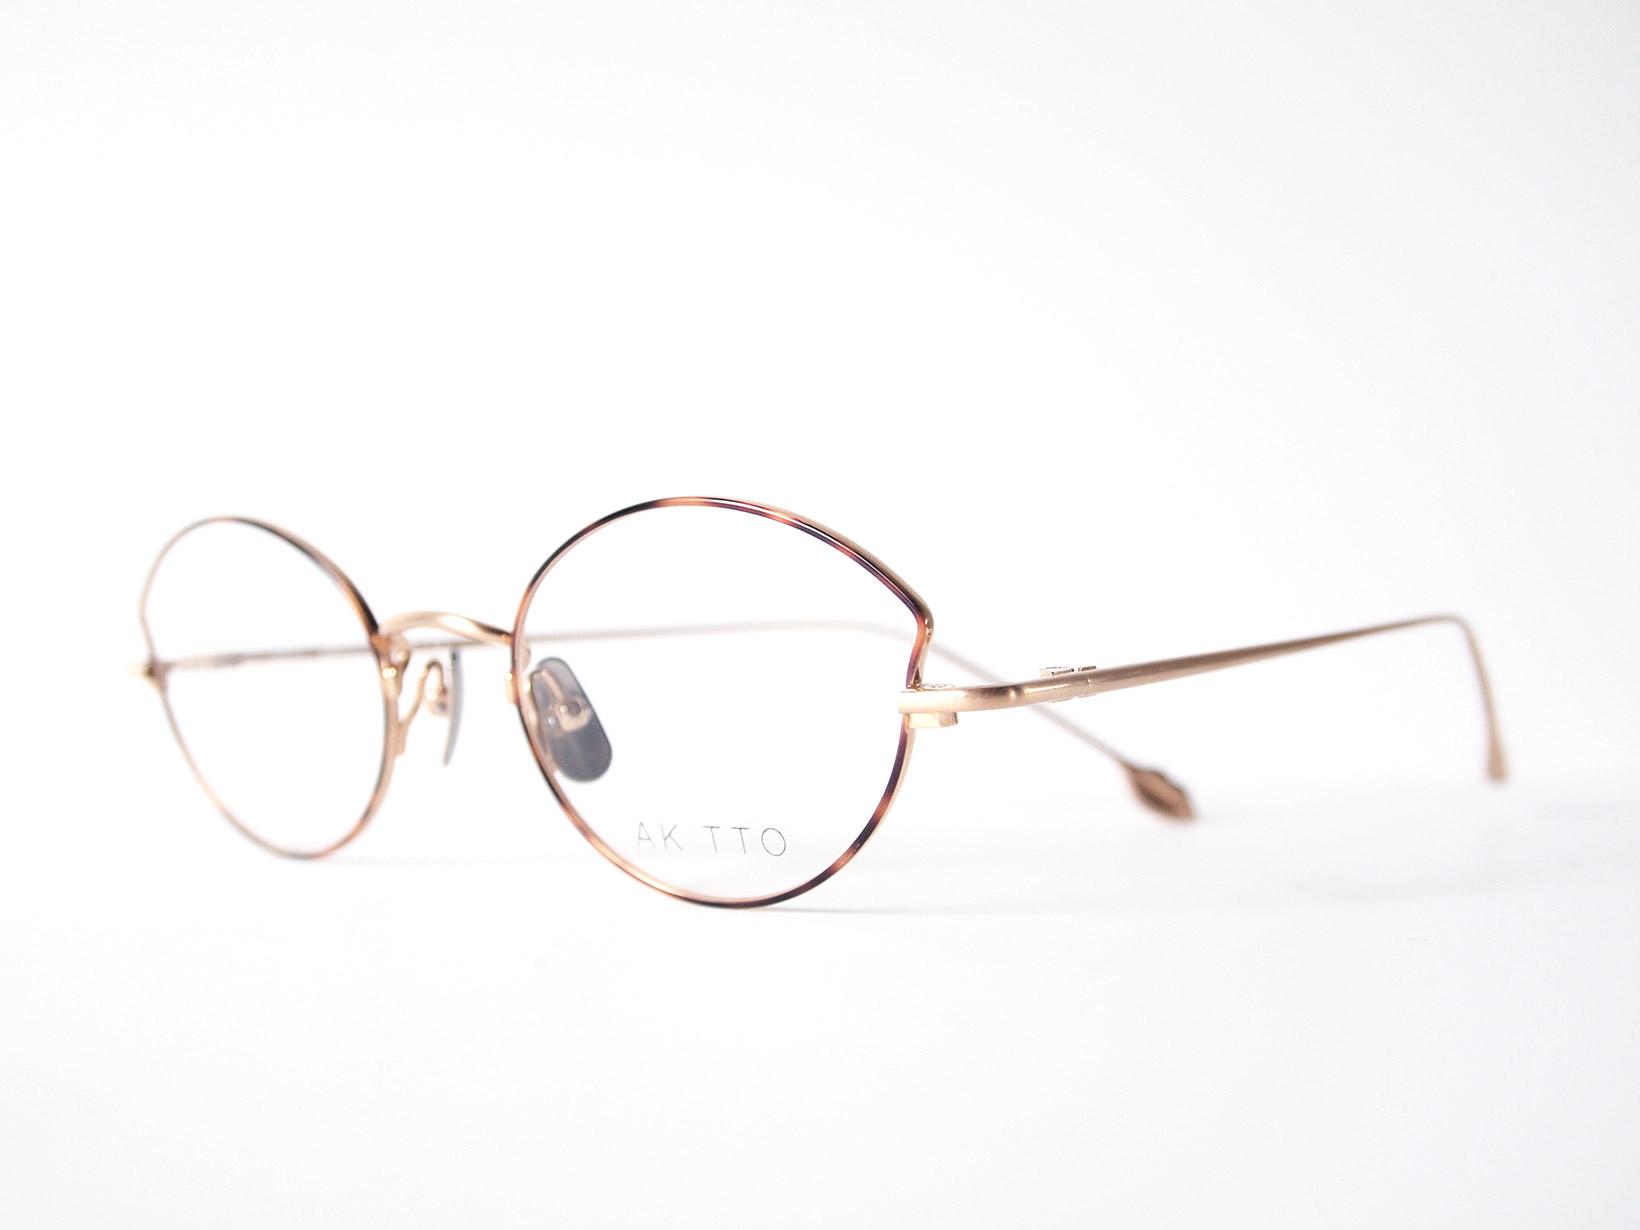 AKITTO 2017-4th pin1 color|DM size:48□20 material:titanium price:¥42,000-(+tax)